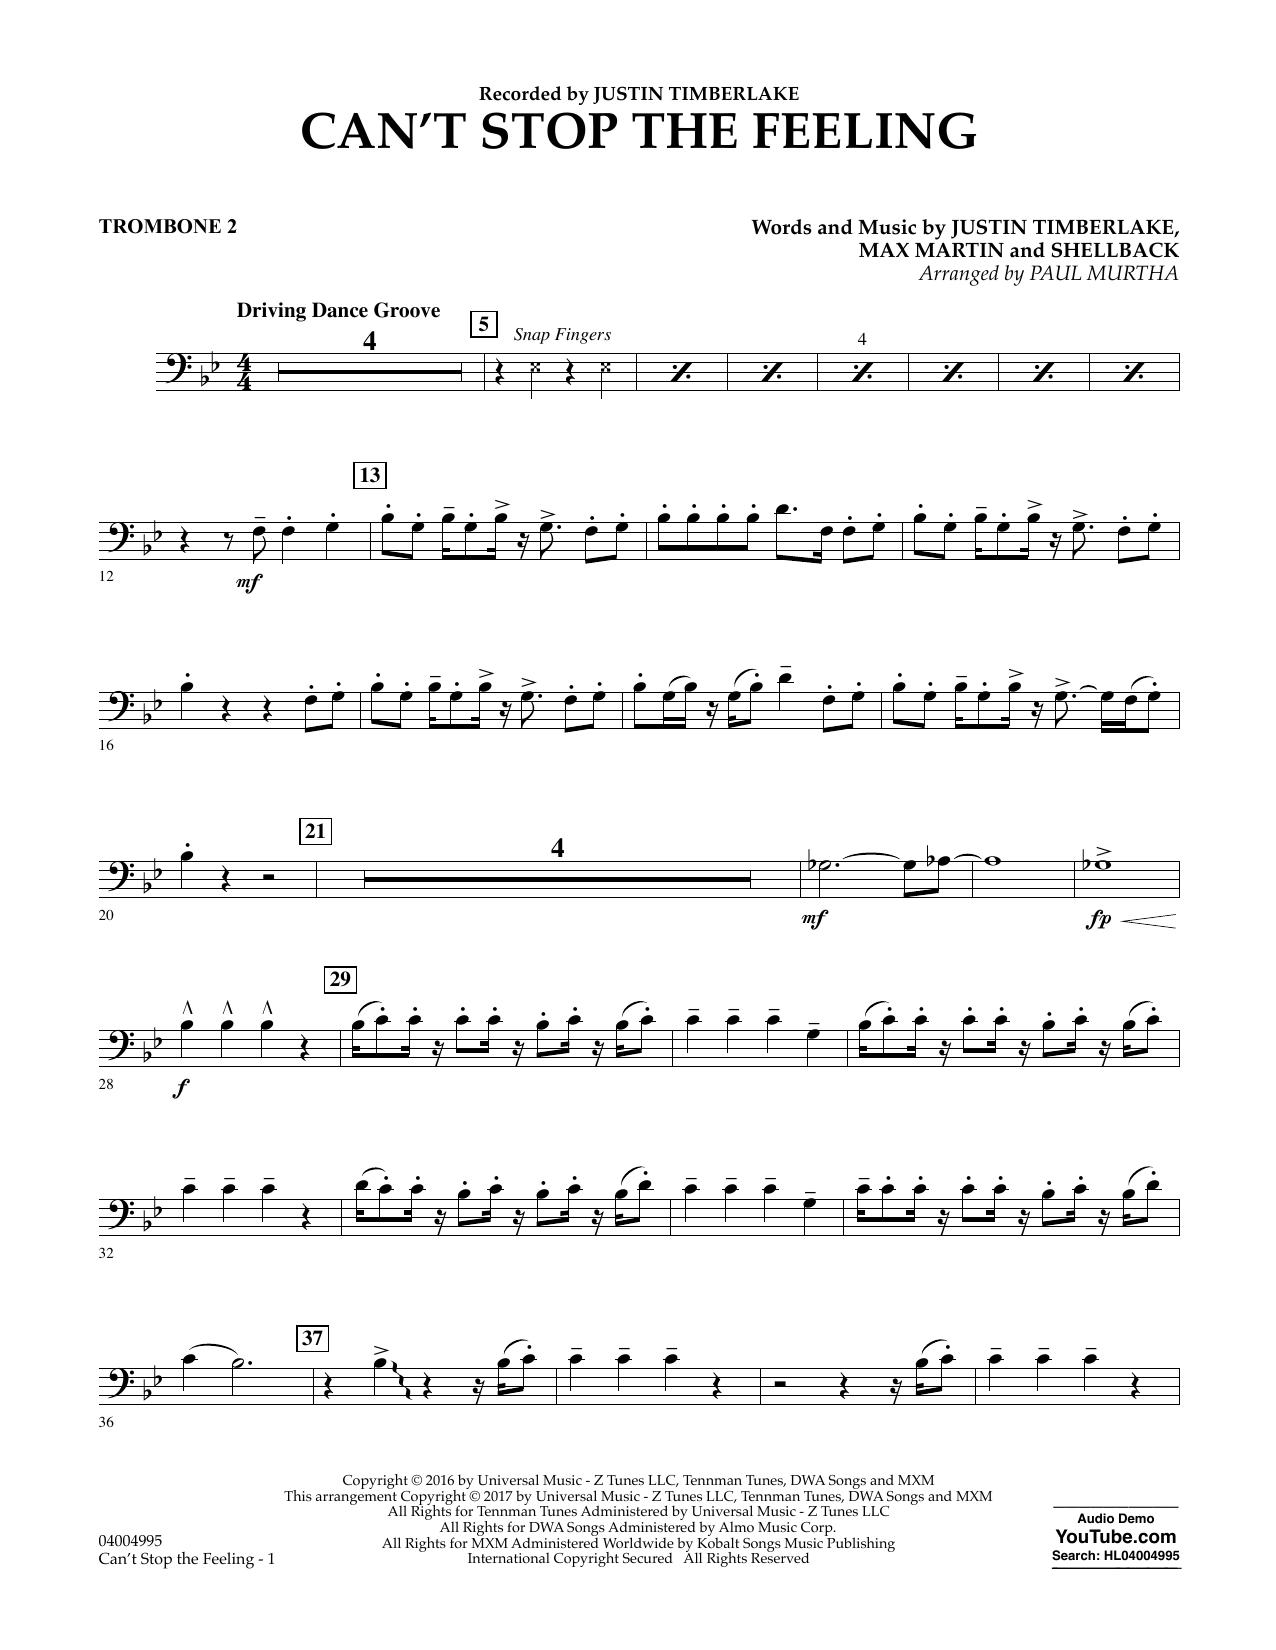 Can't Stop the Feeling - Trombone 2 Sheet Music